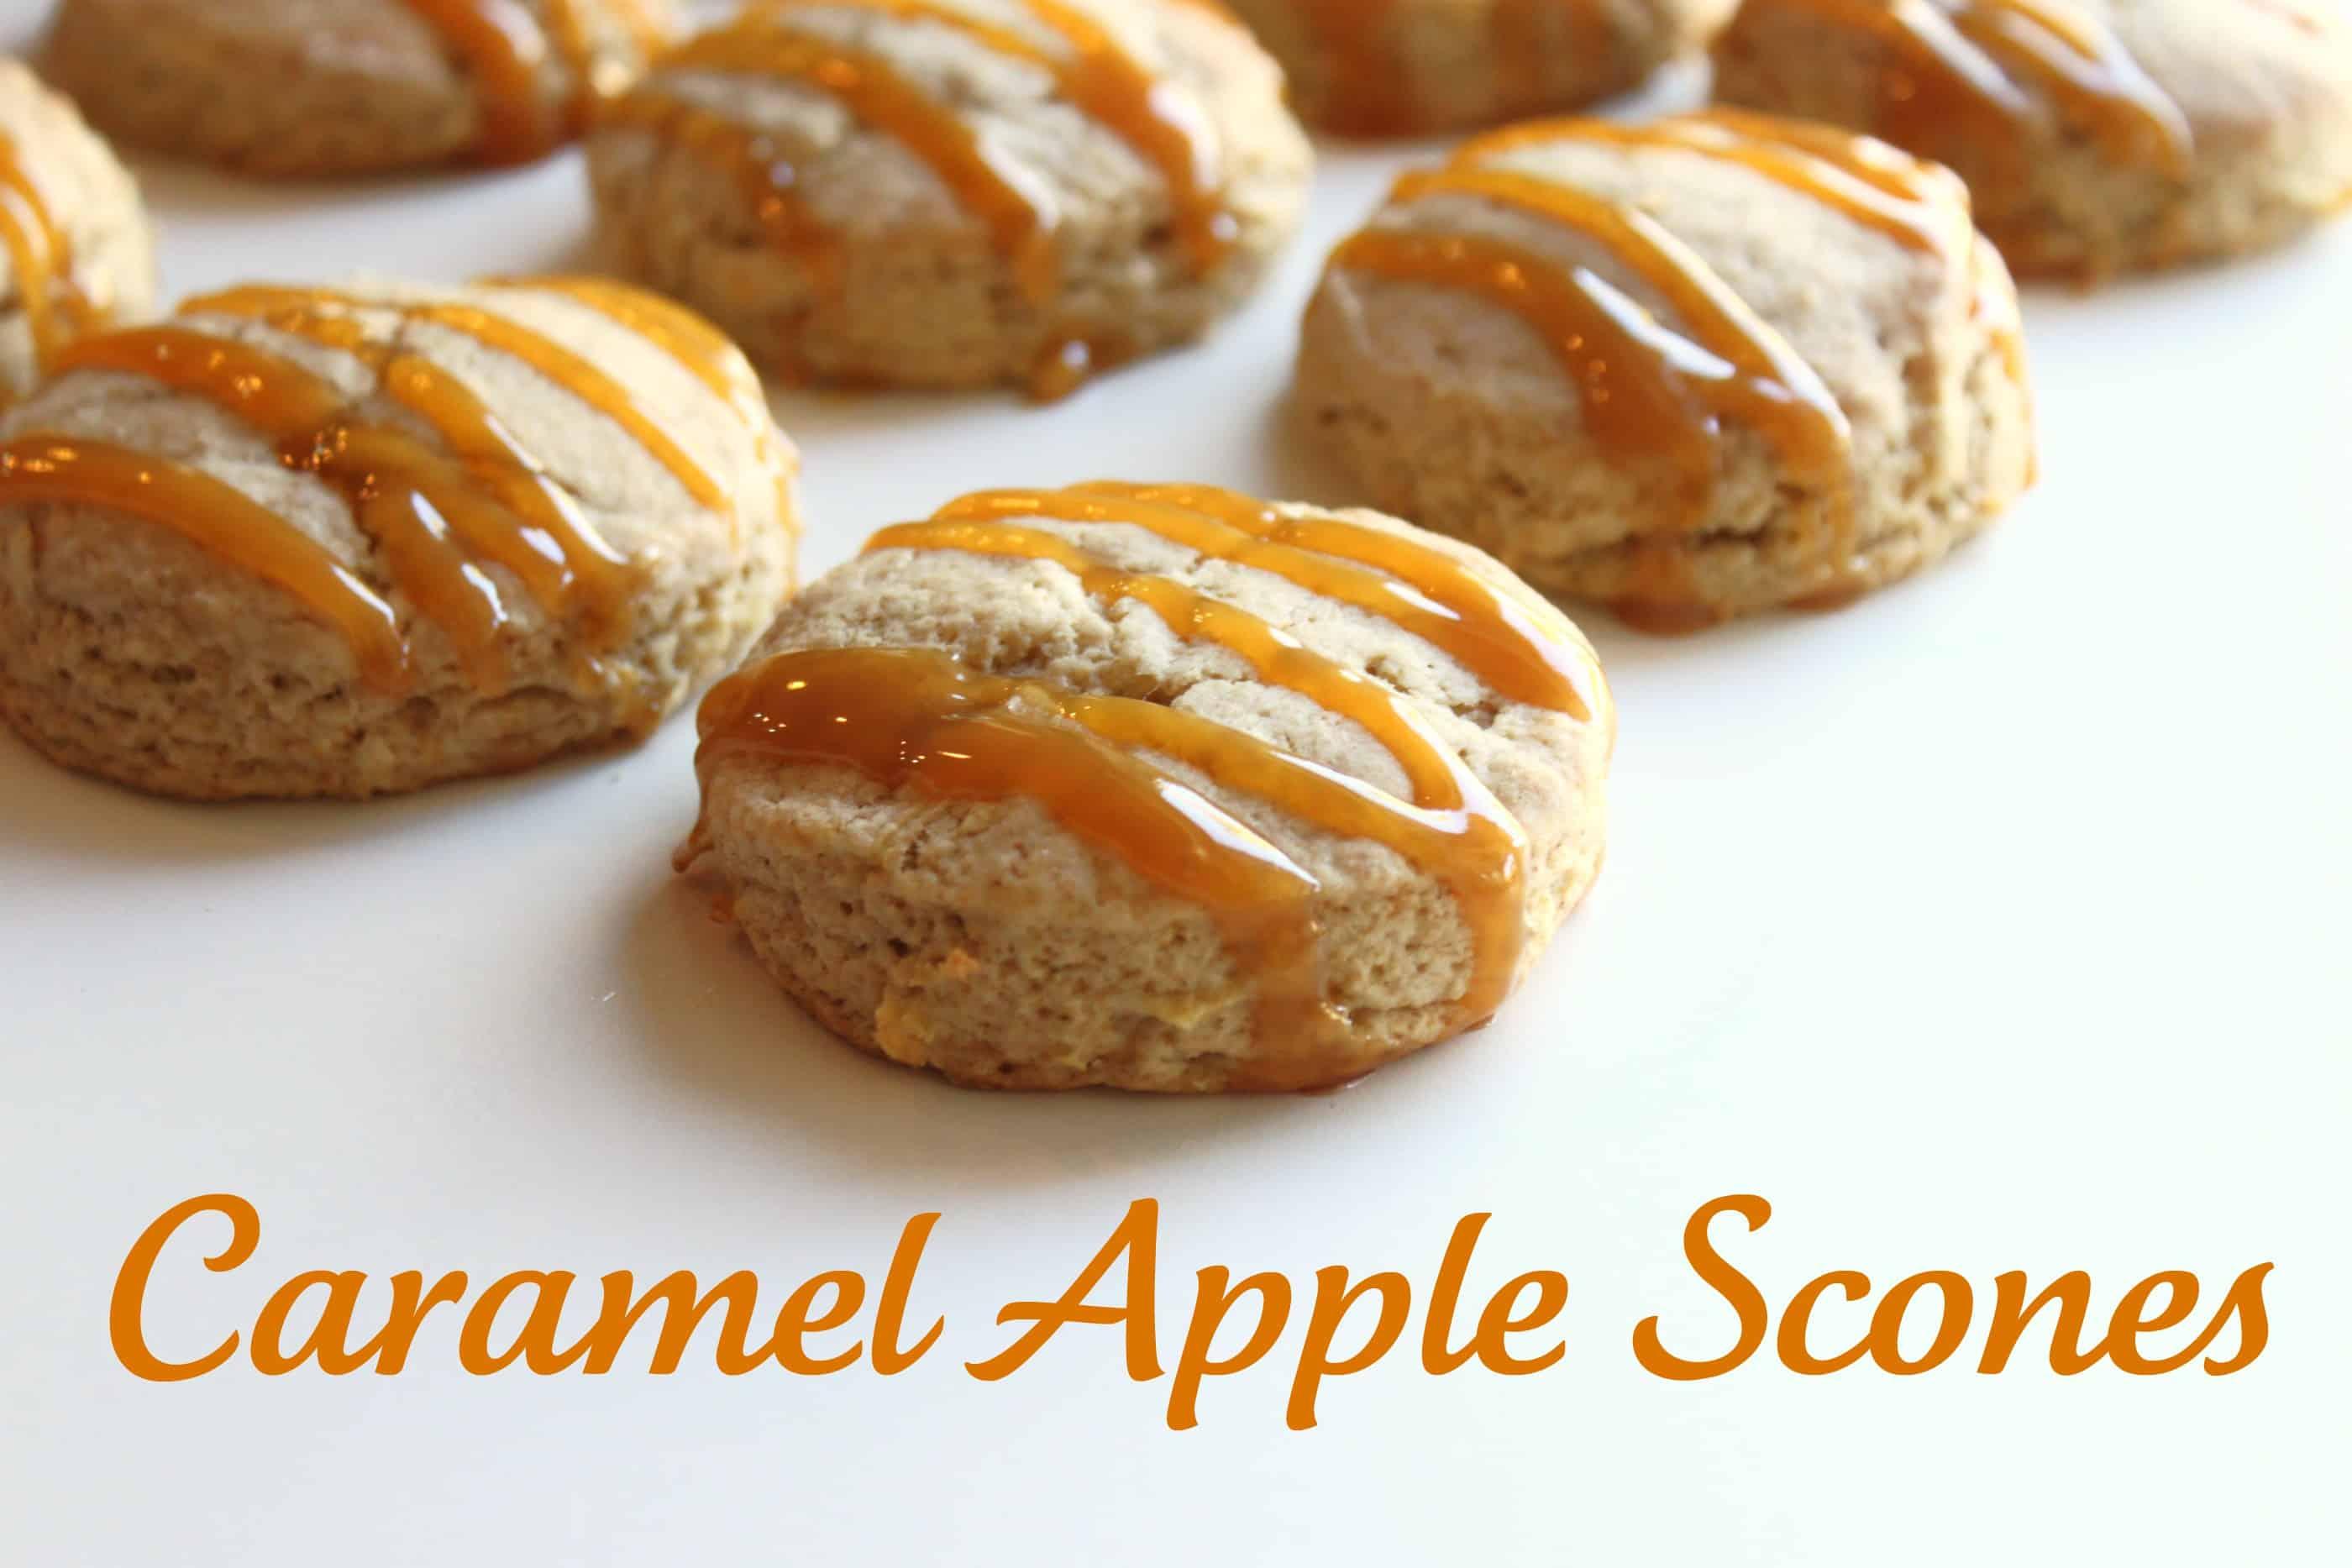 Caramel Apple Scone Recipe | Created by Diane